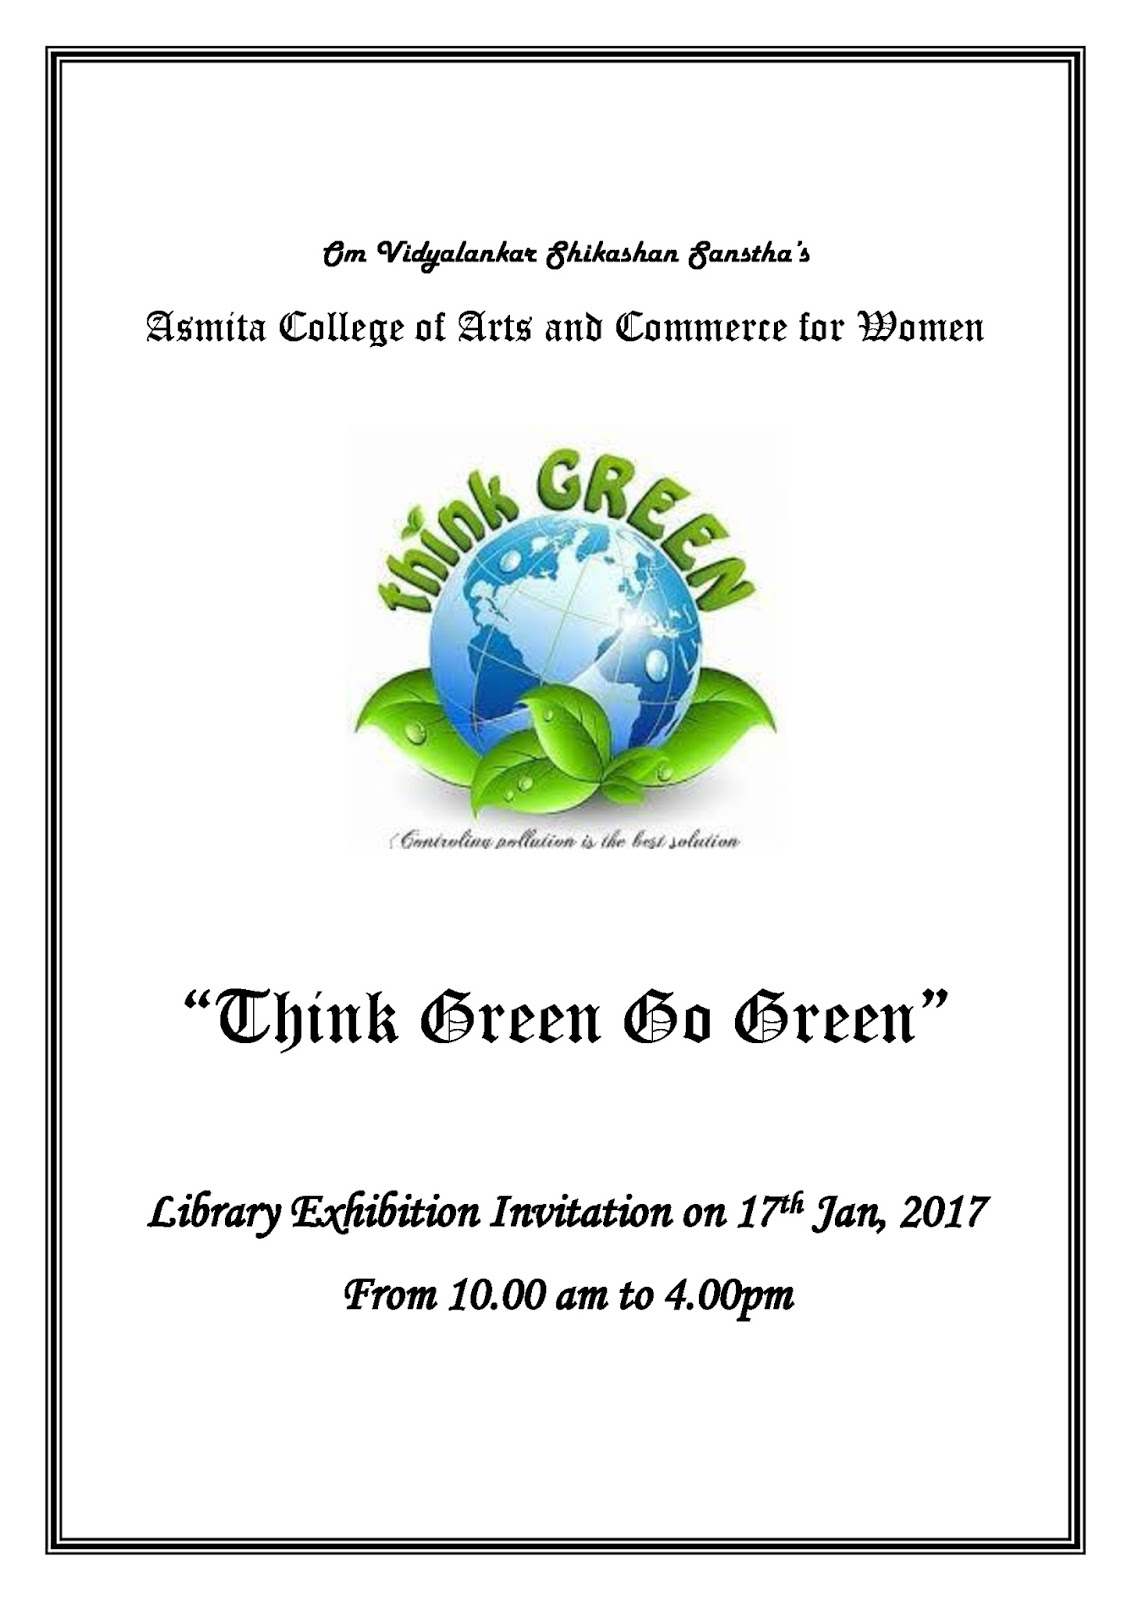 Asmita College Library Invitation For Library Exhibition